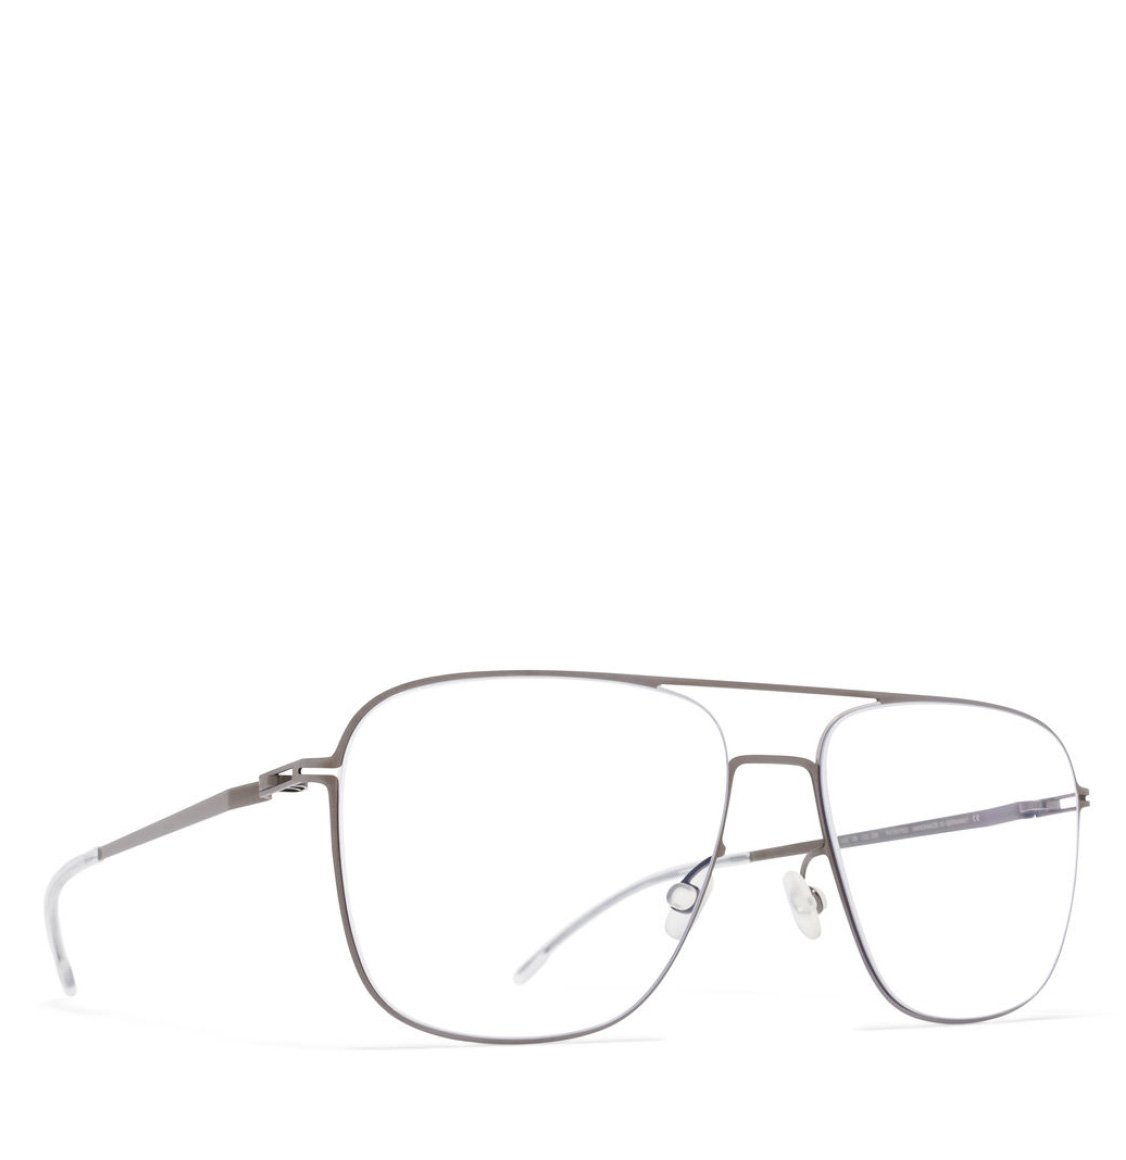 Mykita Lite Steen Silver Graphite Γυαλιά Οράσεως